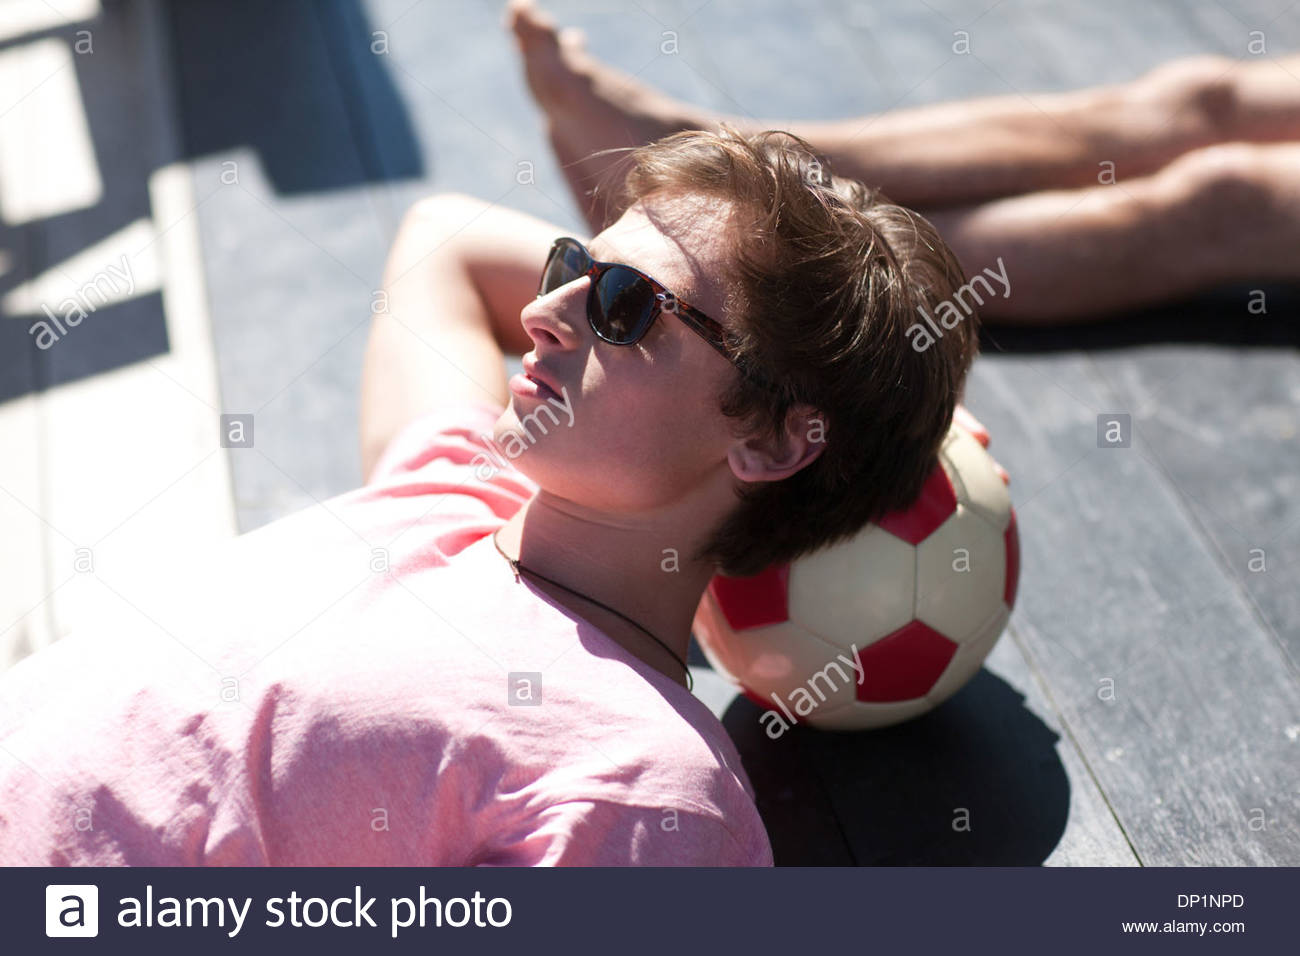 Man resting head on soccer ball - Stock Image